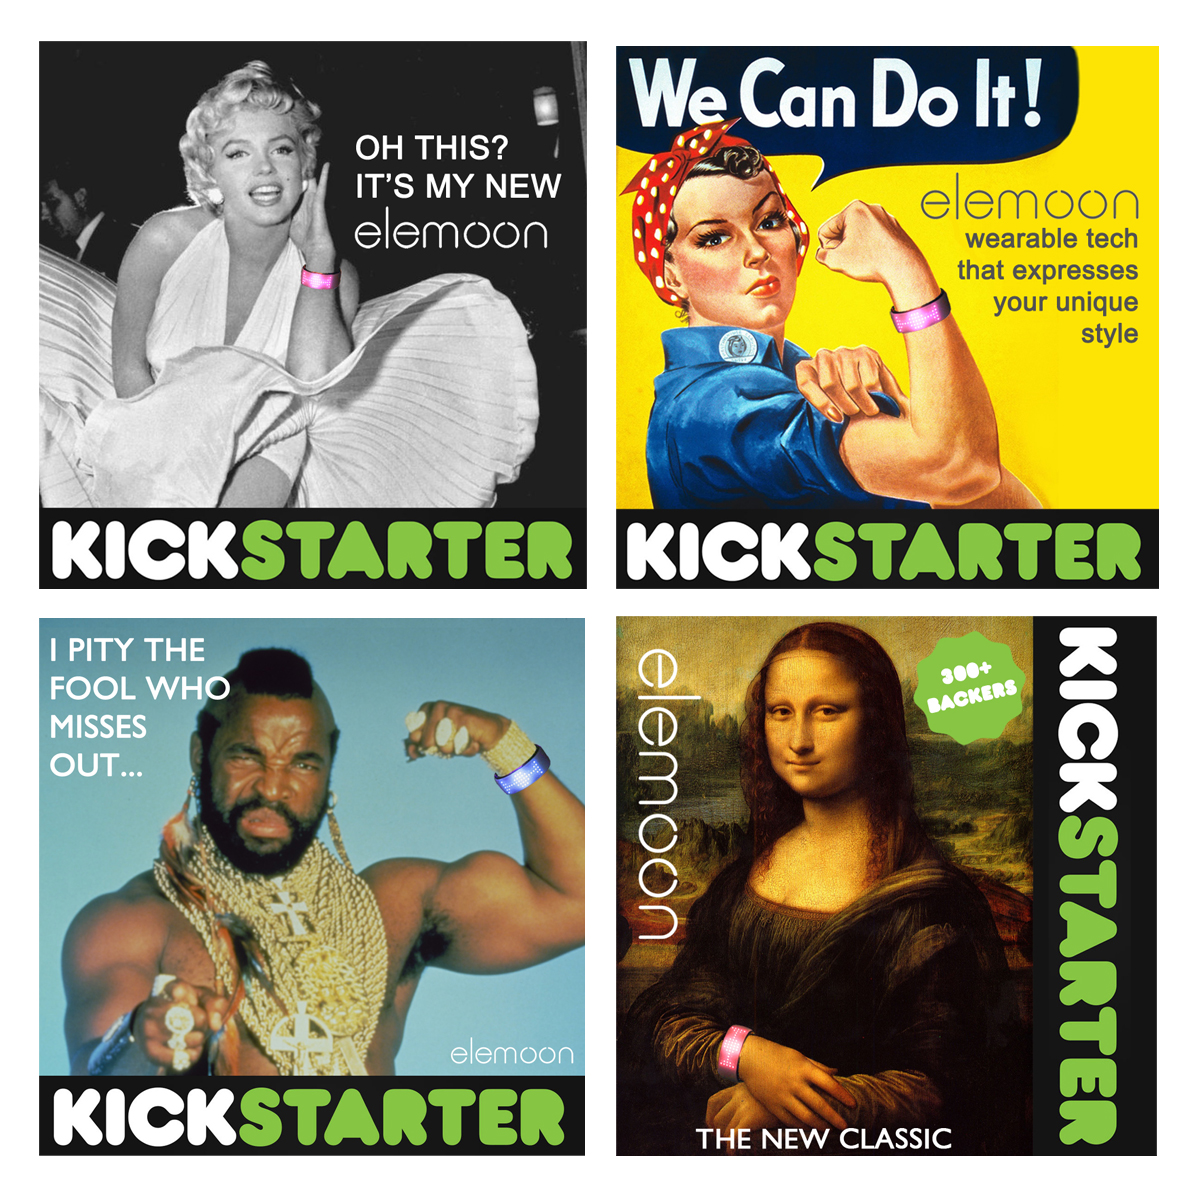 Elemoon Kickstarter images